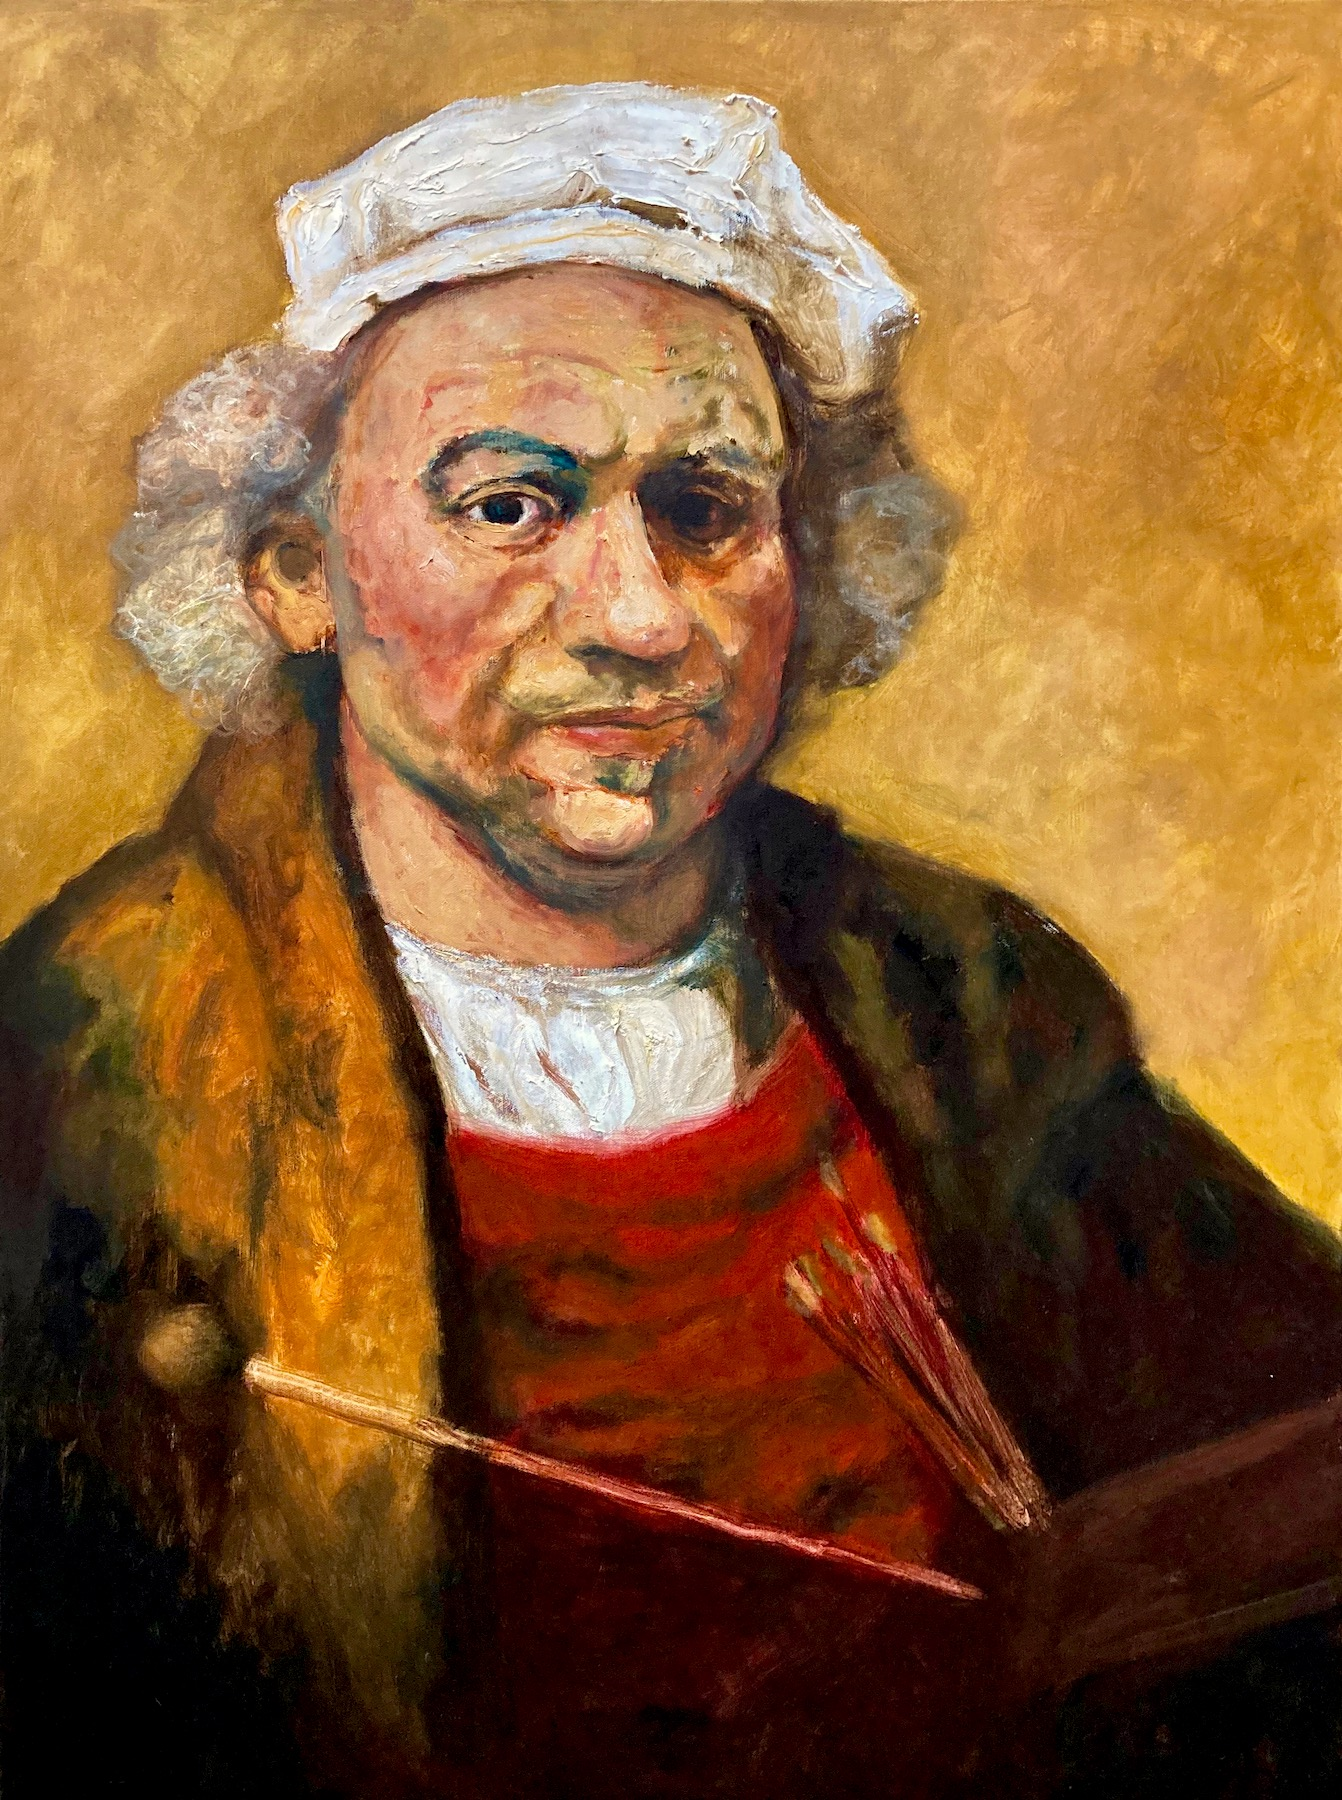 Santiago Pérez: Meditation on Rembrandt 4